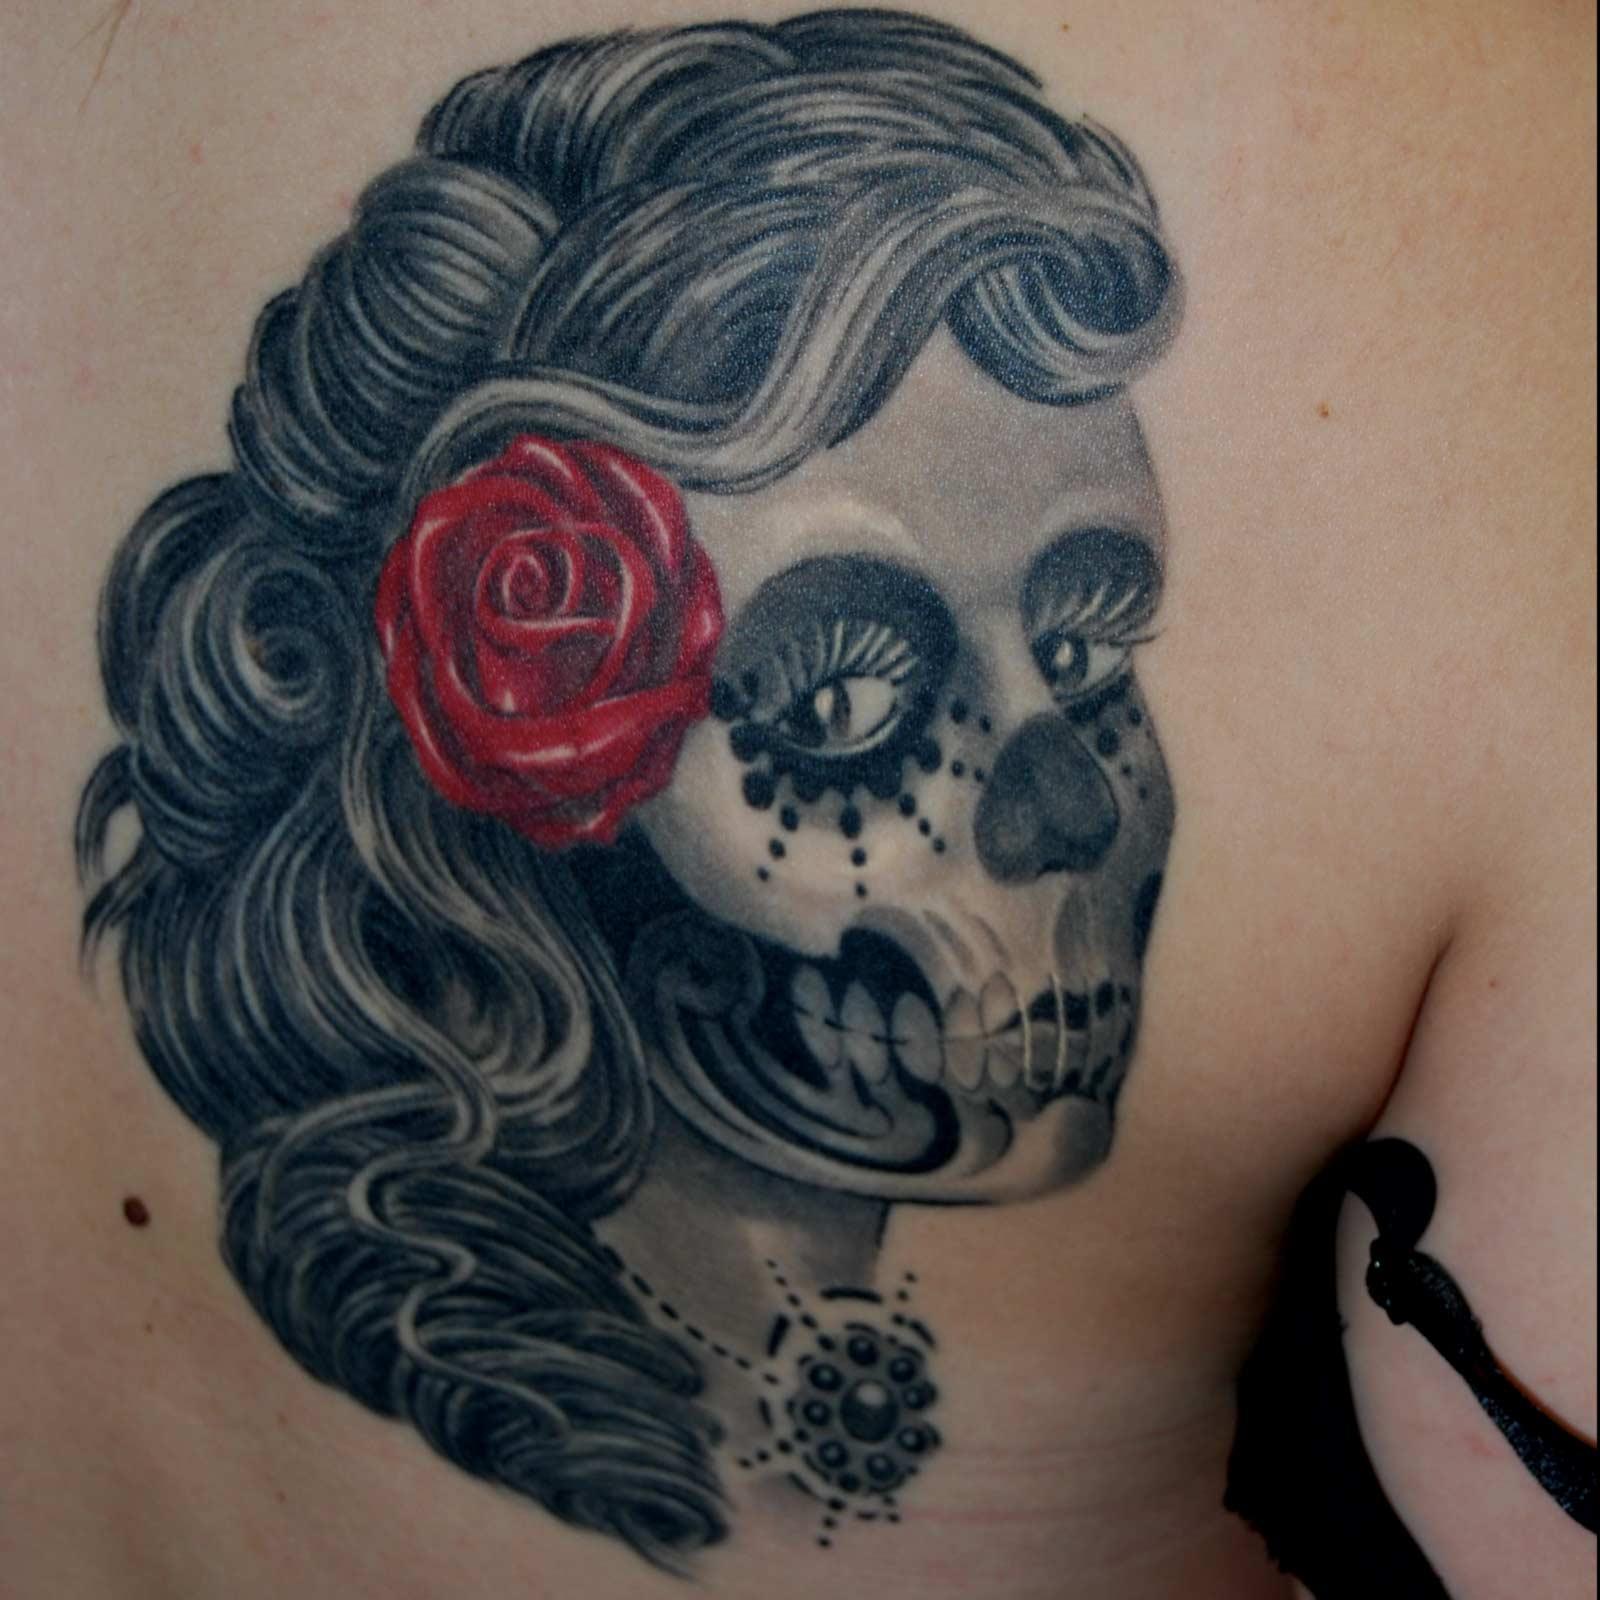 la catrina Sugarskull Day of the dead Totenkopf frau Tattoo München  mit bester Empfehlung